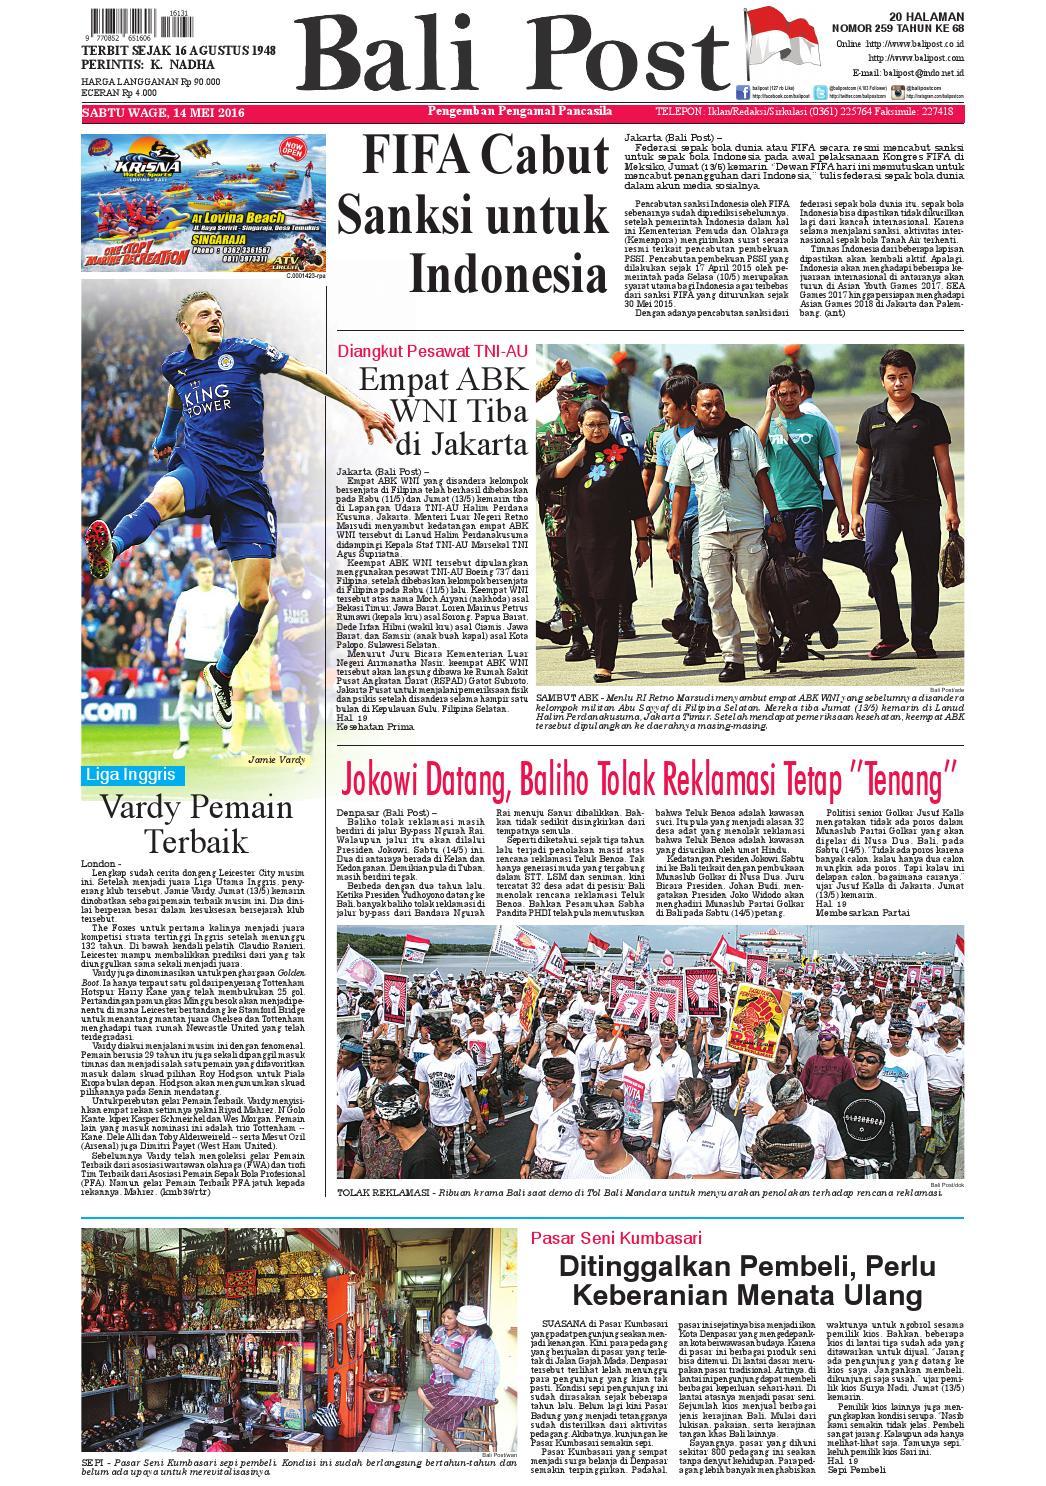 Edisi 14 Mei 2016 Balipostcom By E Paper Kmb Issuu Strong Kangen Water Ph 115 Ukuran 1000 Ml Terapi Air Kelas Dunia Indonesia